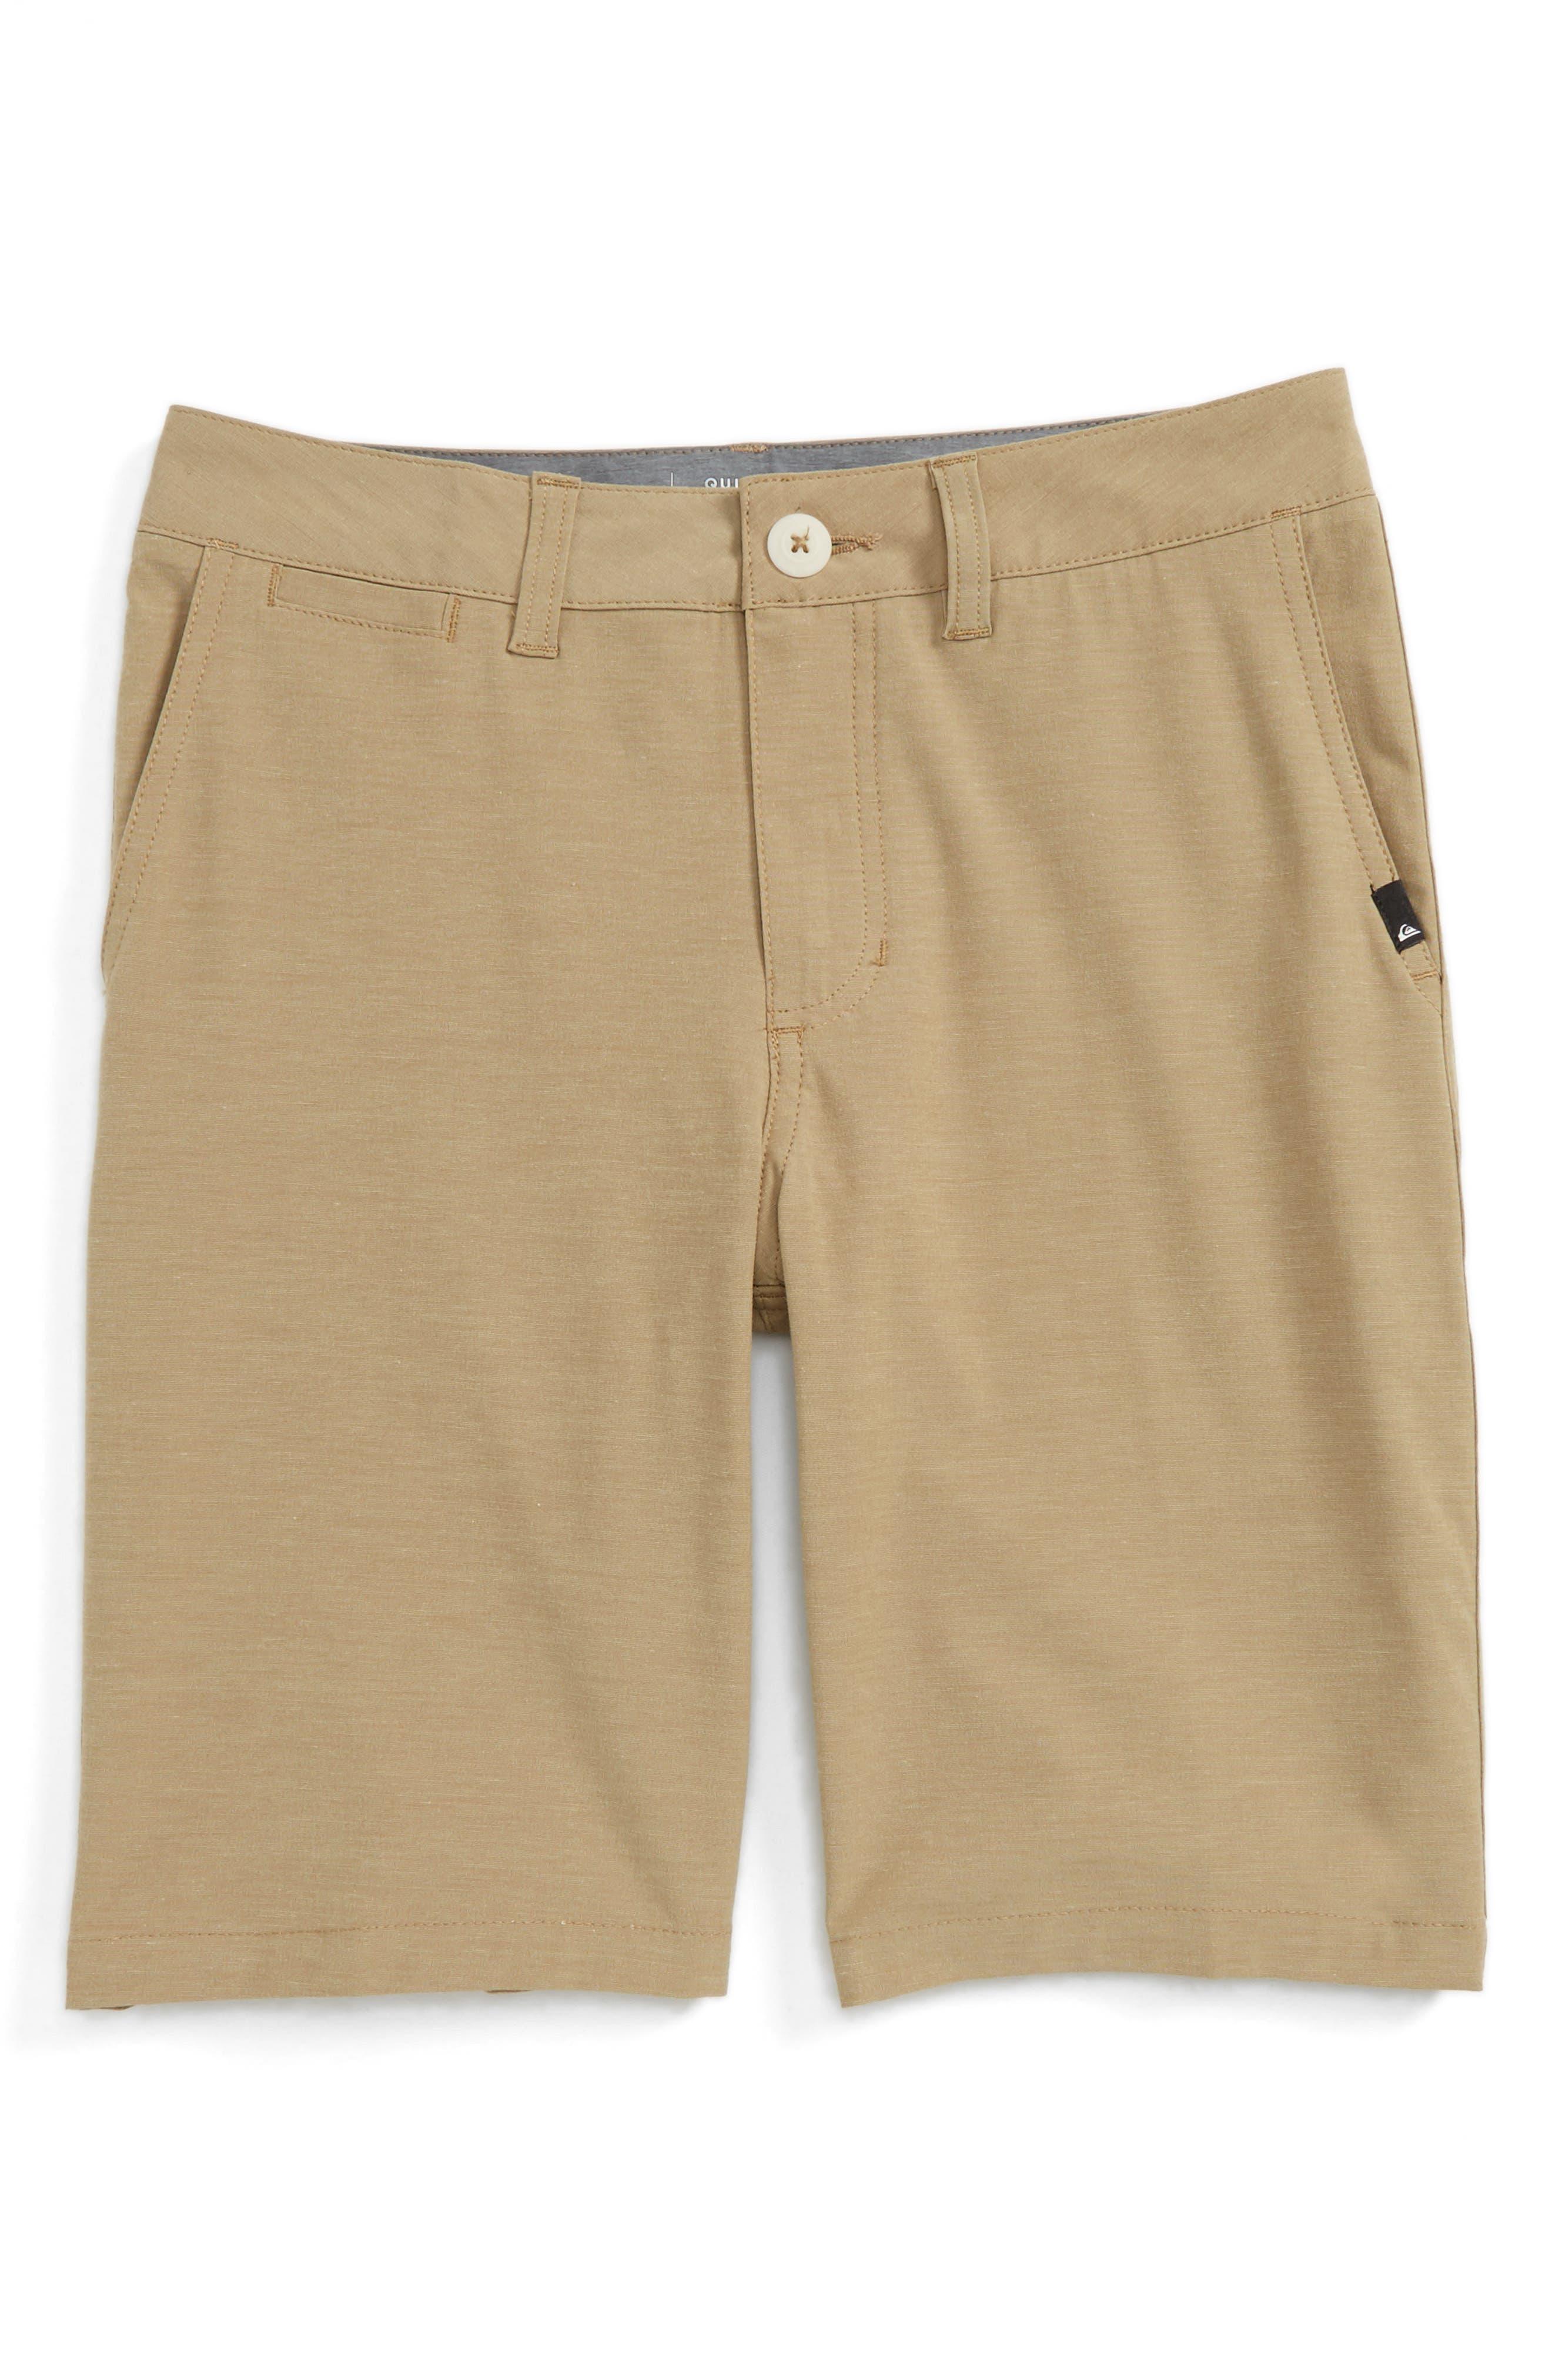 Main Image - Quiksilver Amphibian Hybrid Shorts (Big Boys)